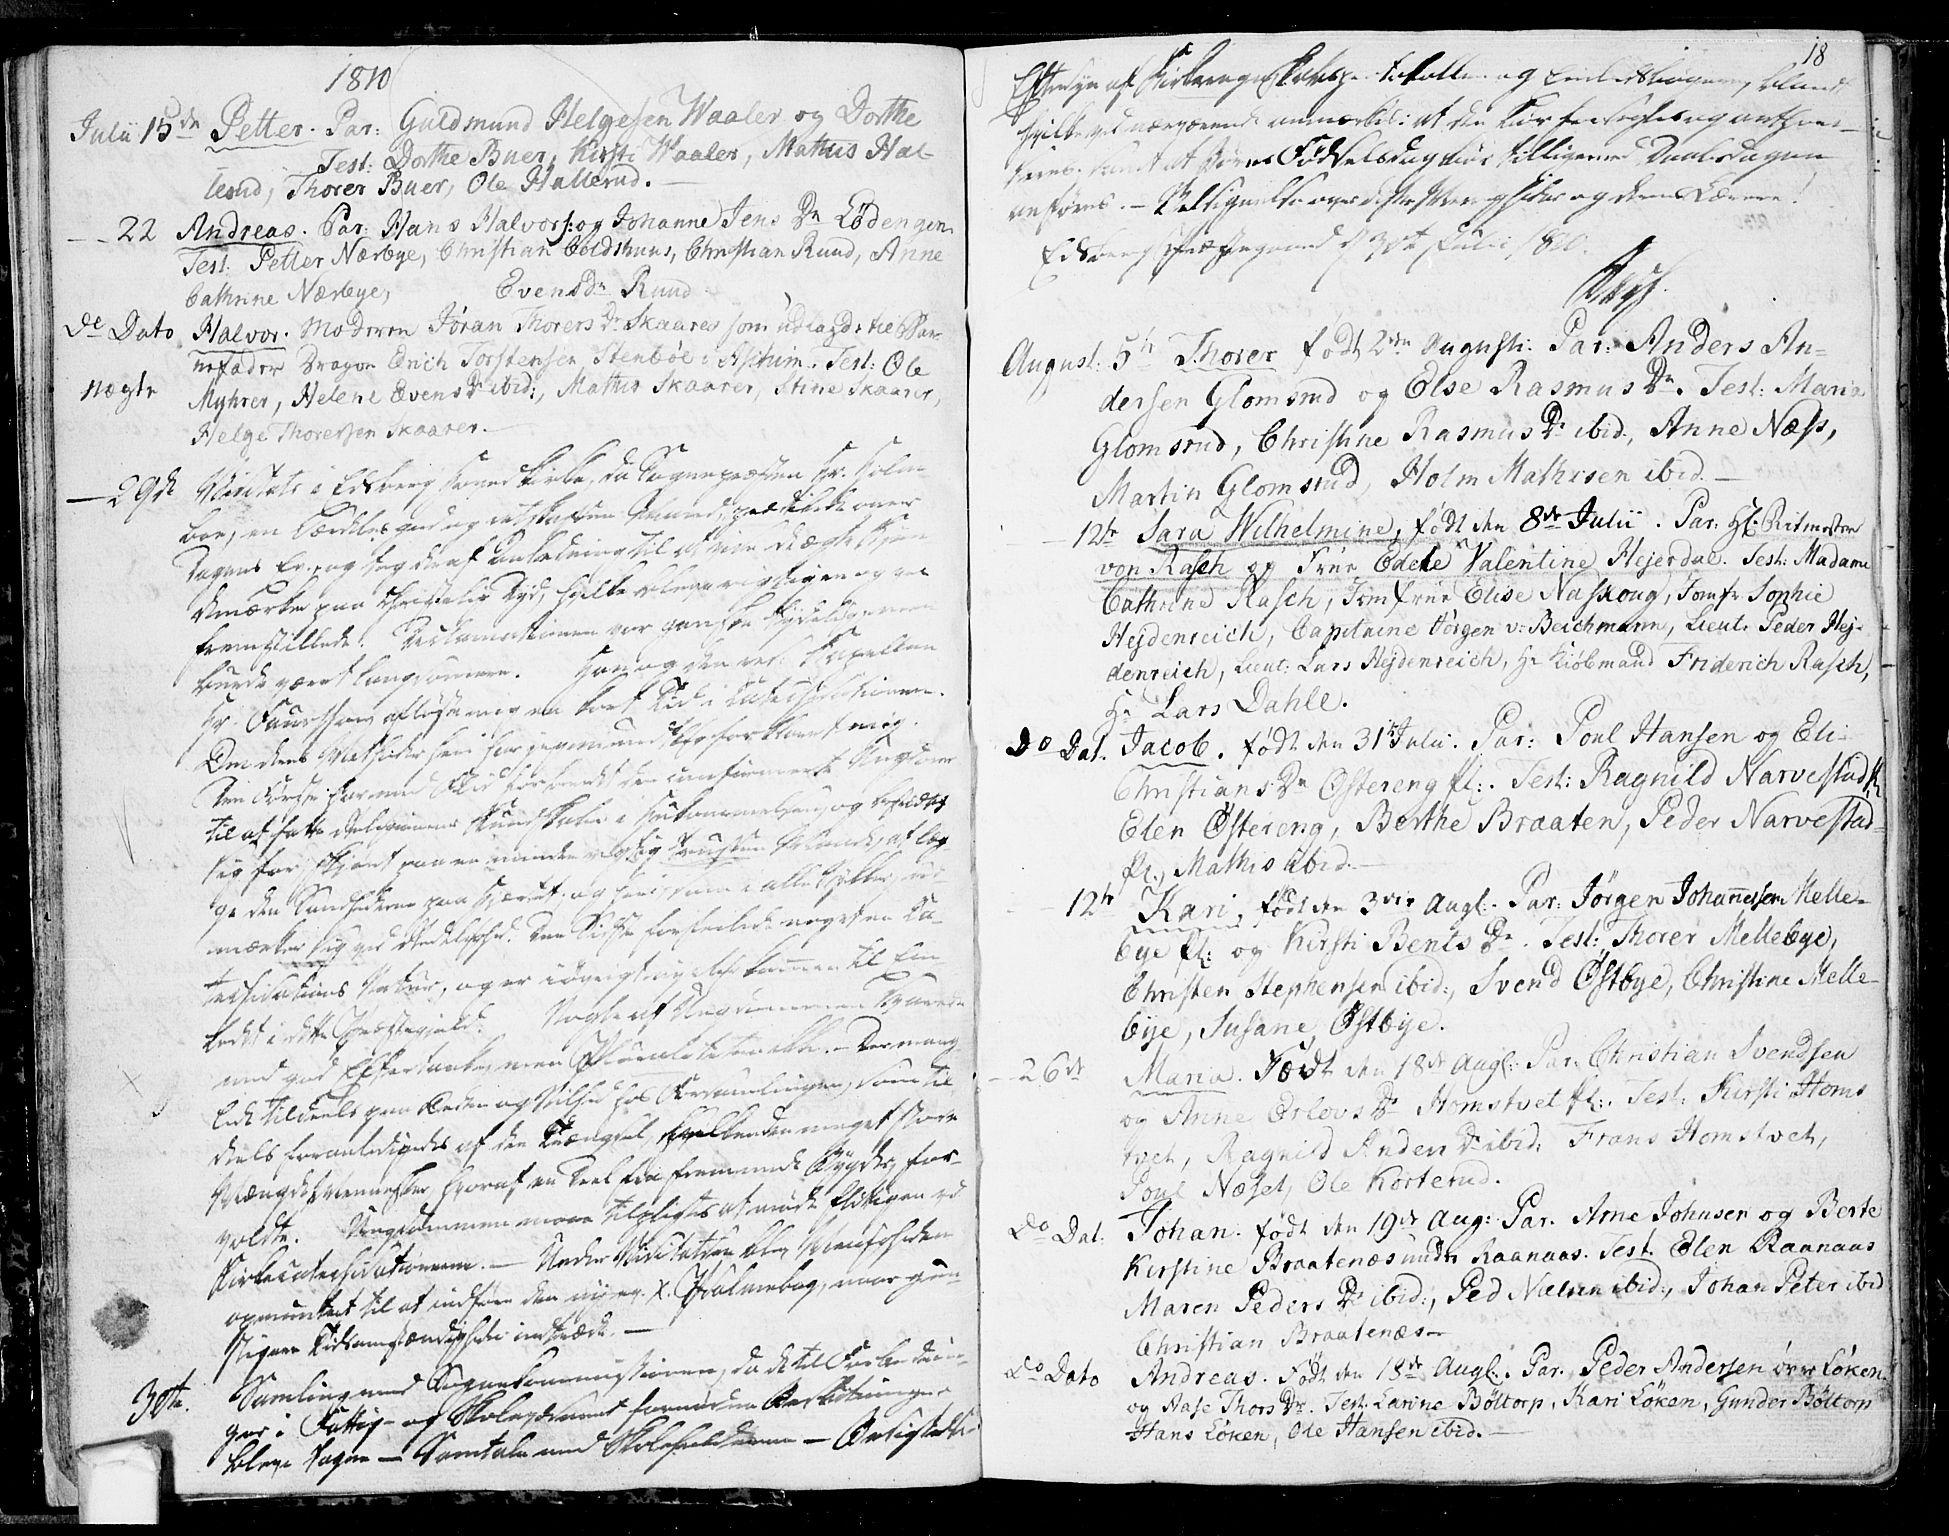 SAO, Eidsberg prestekontor Kirkebøker, F/Fa/L0006: Ministerialbok nr. I 6, 1807-1814, s. 18